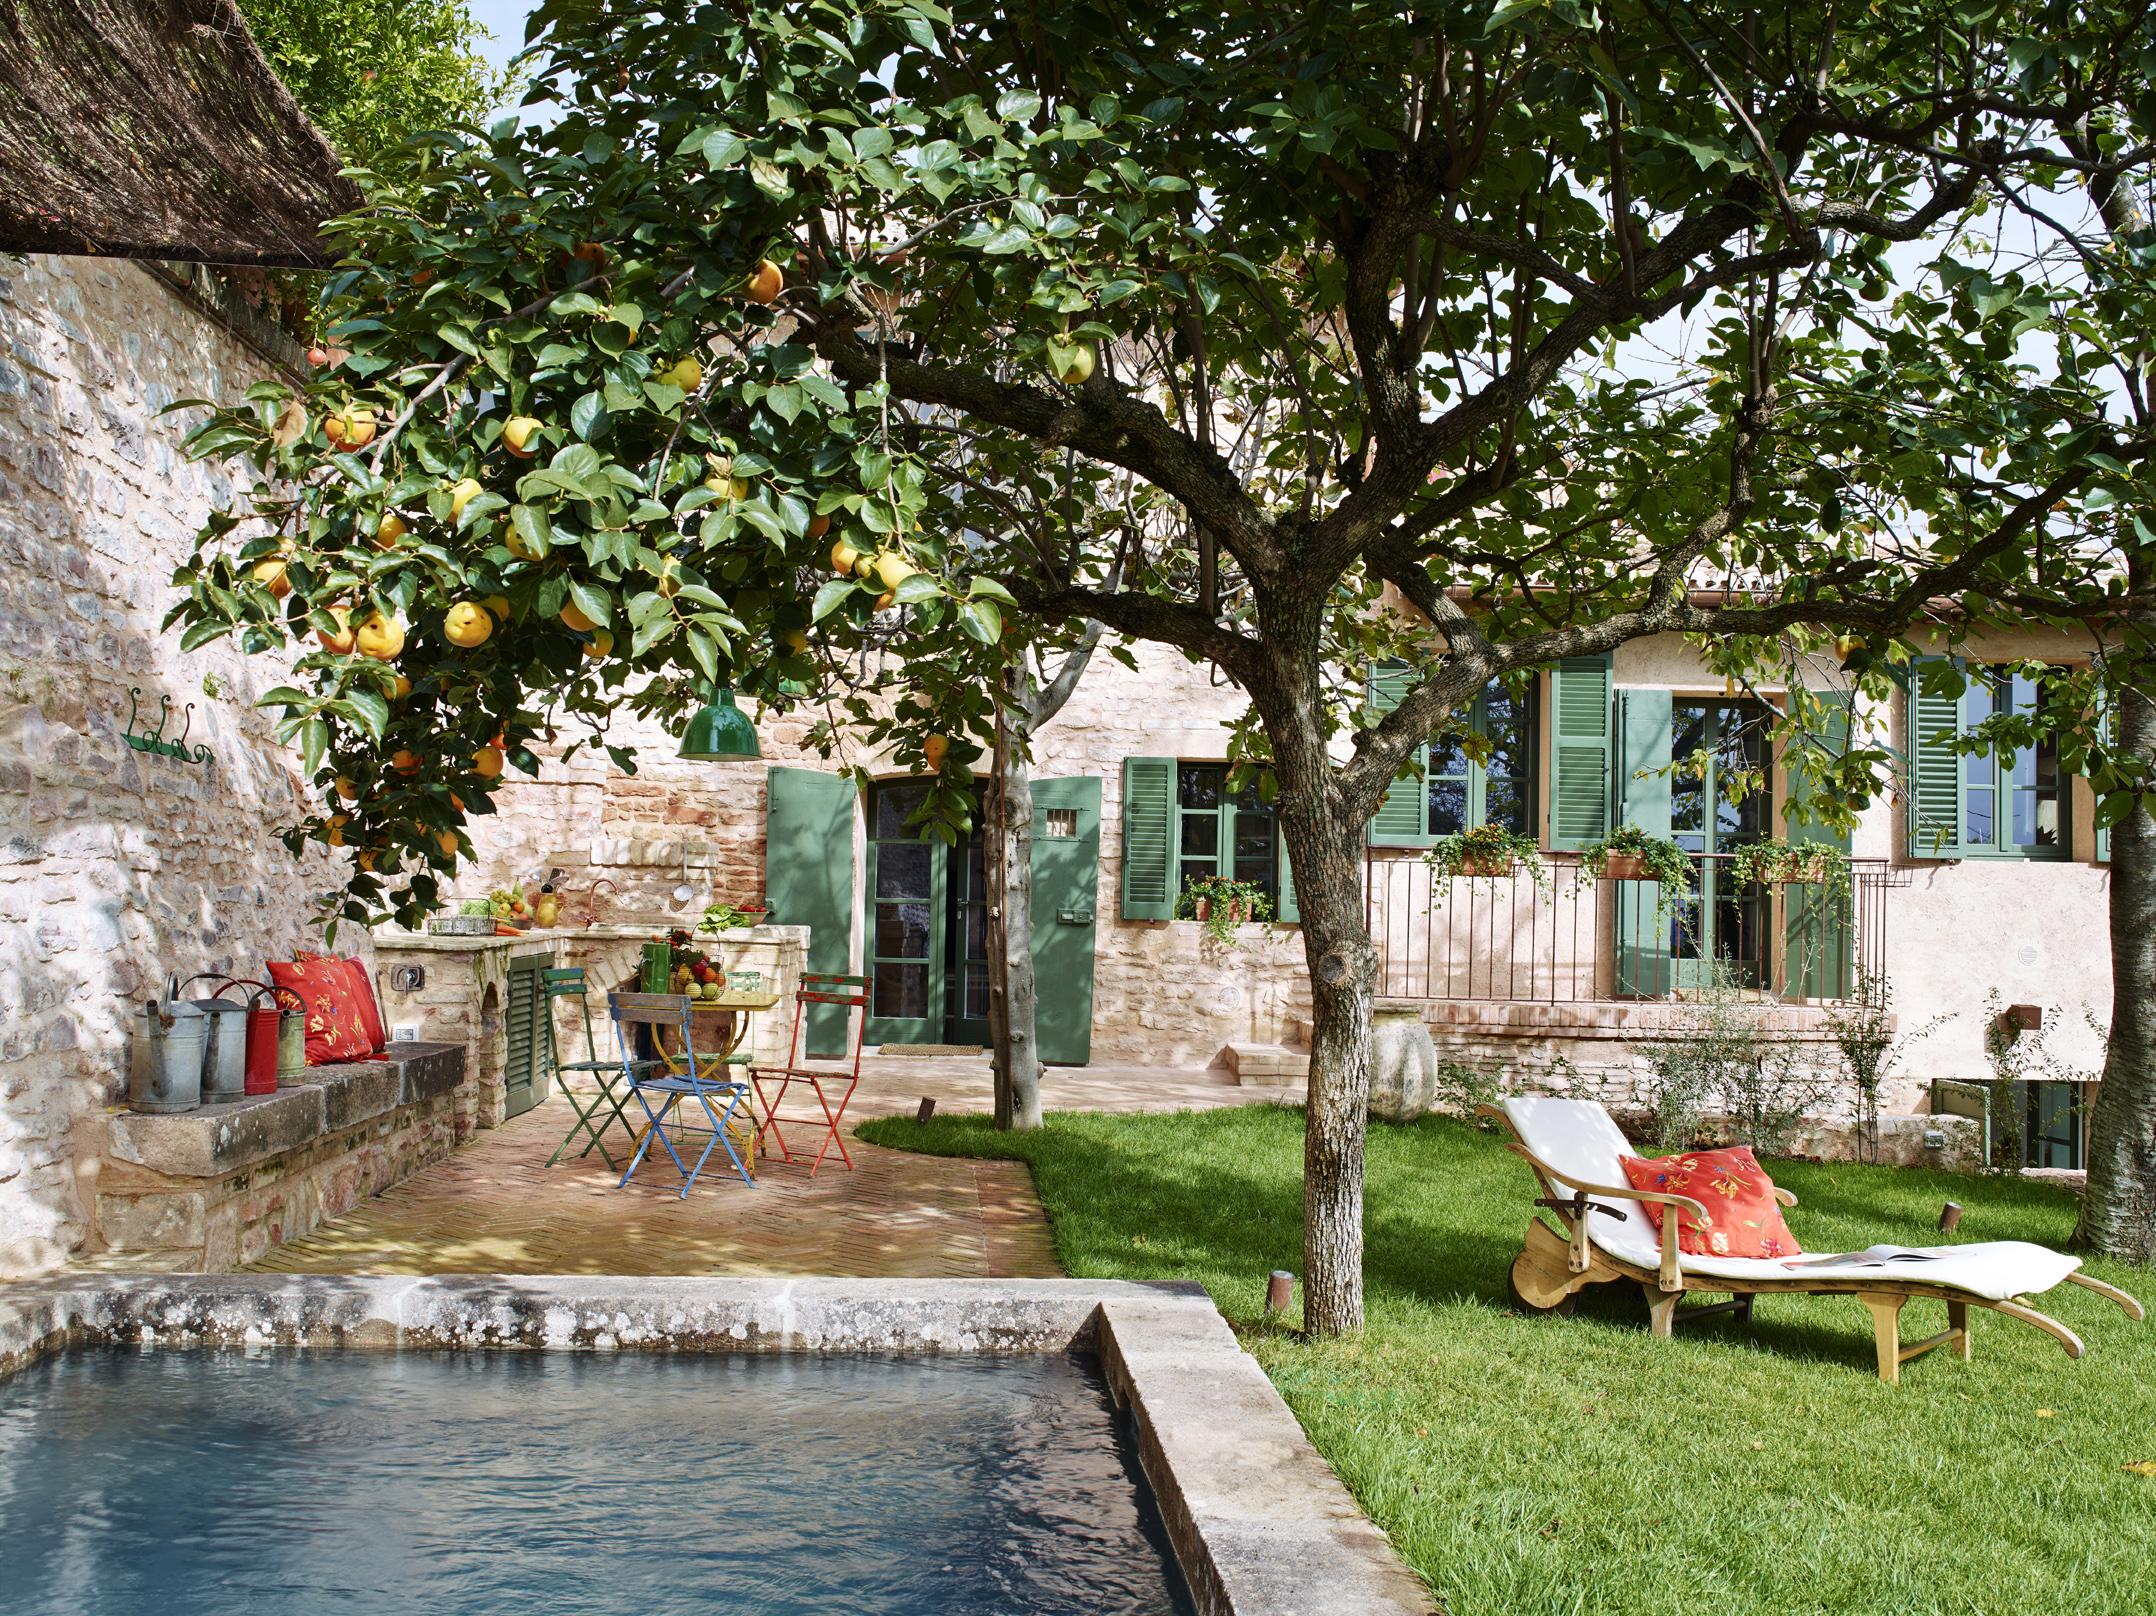 Holiday home in spello in umbria near tuscany casa giardino - Giardino in casa ...